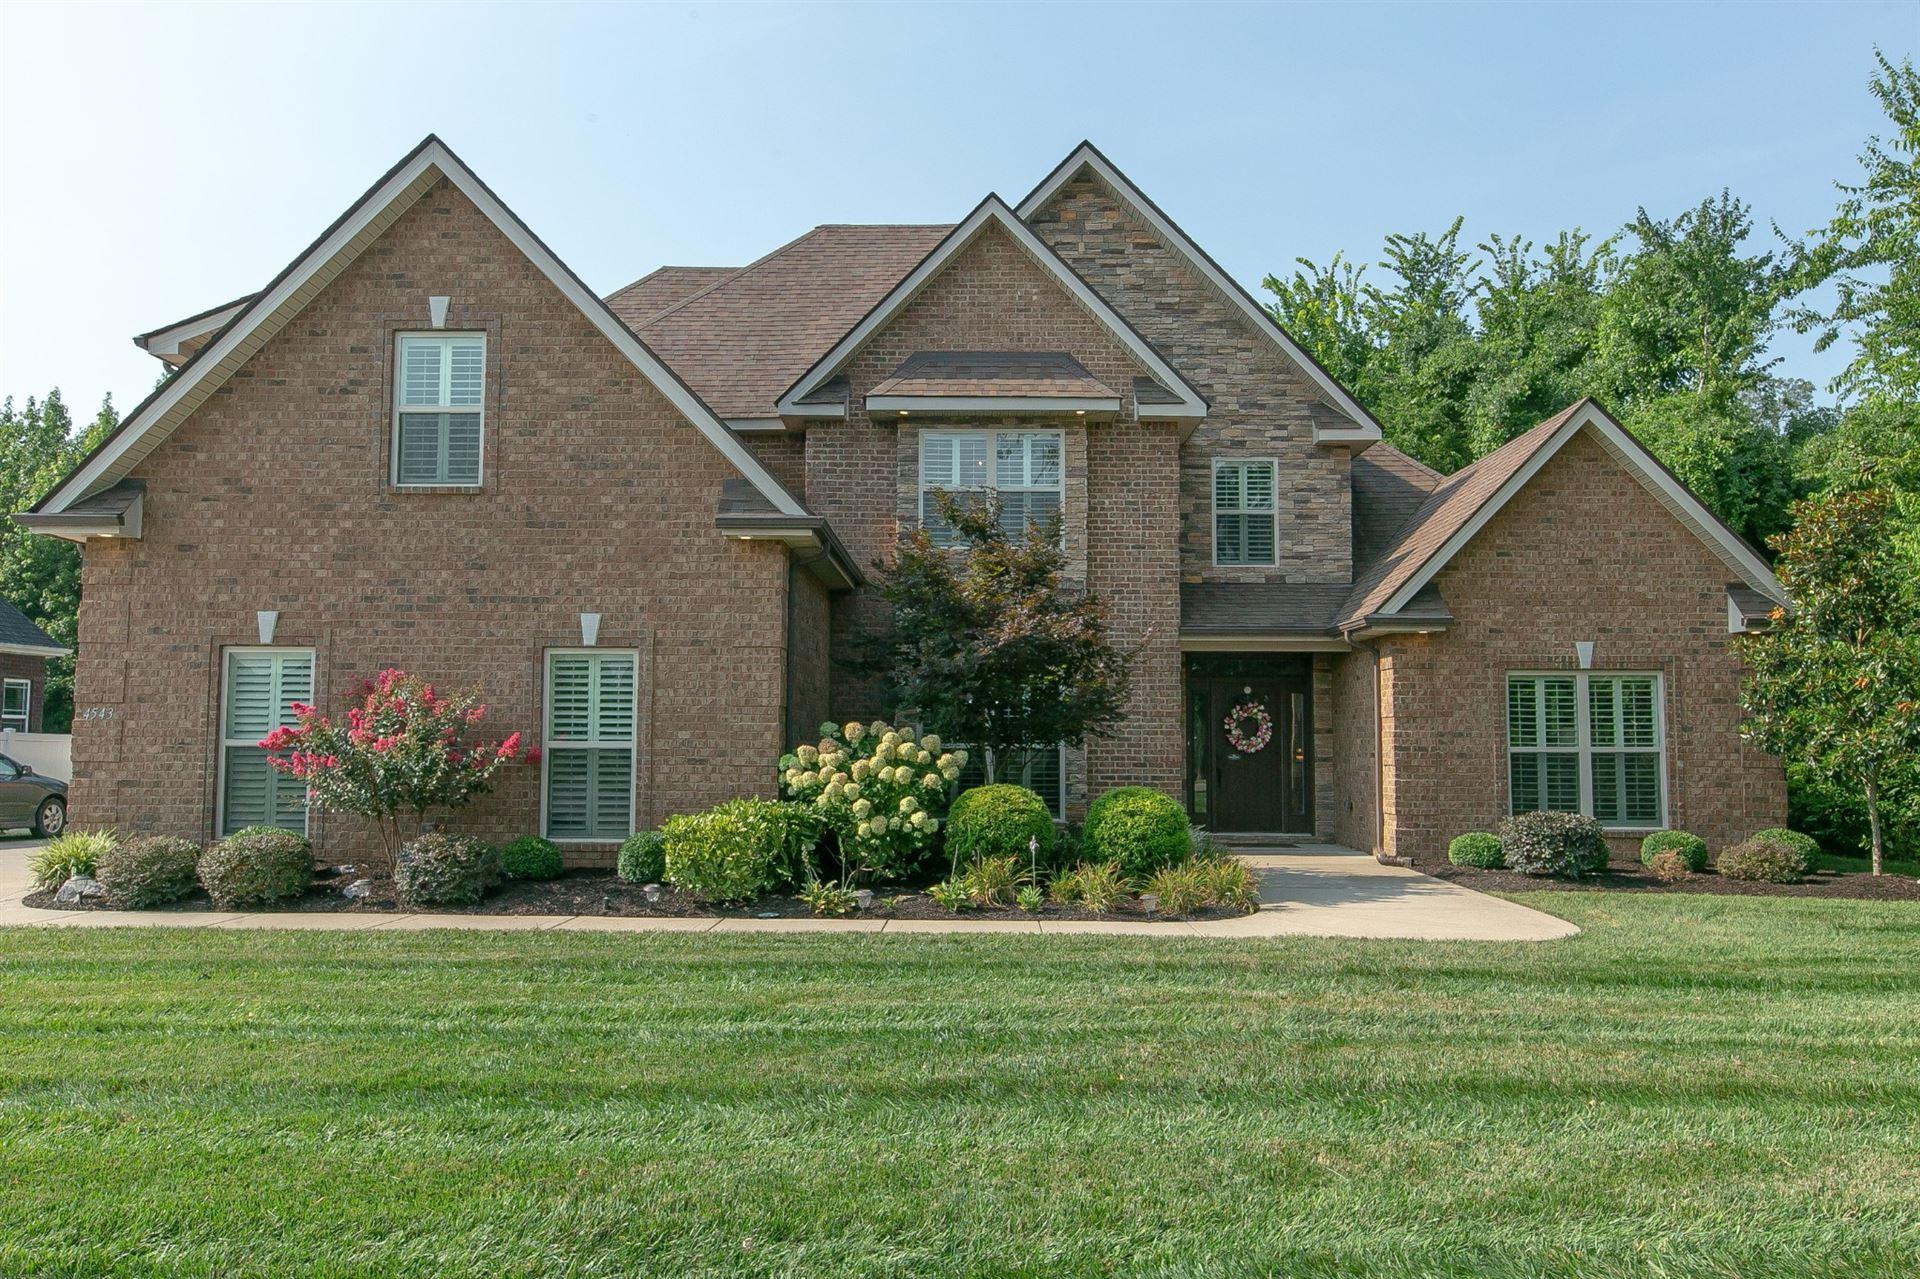 4543 Smitty Drive, Murfreesboro, TN 37128 - MLS#: 2277262